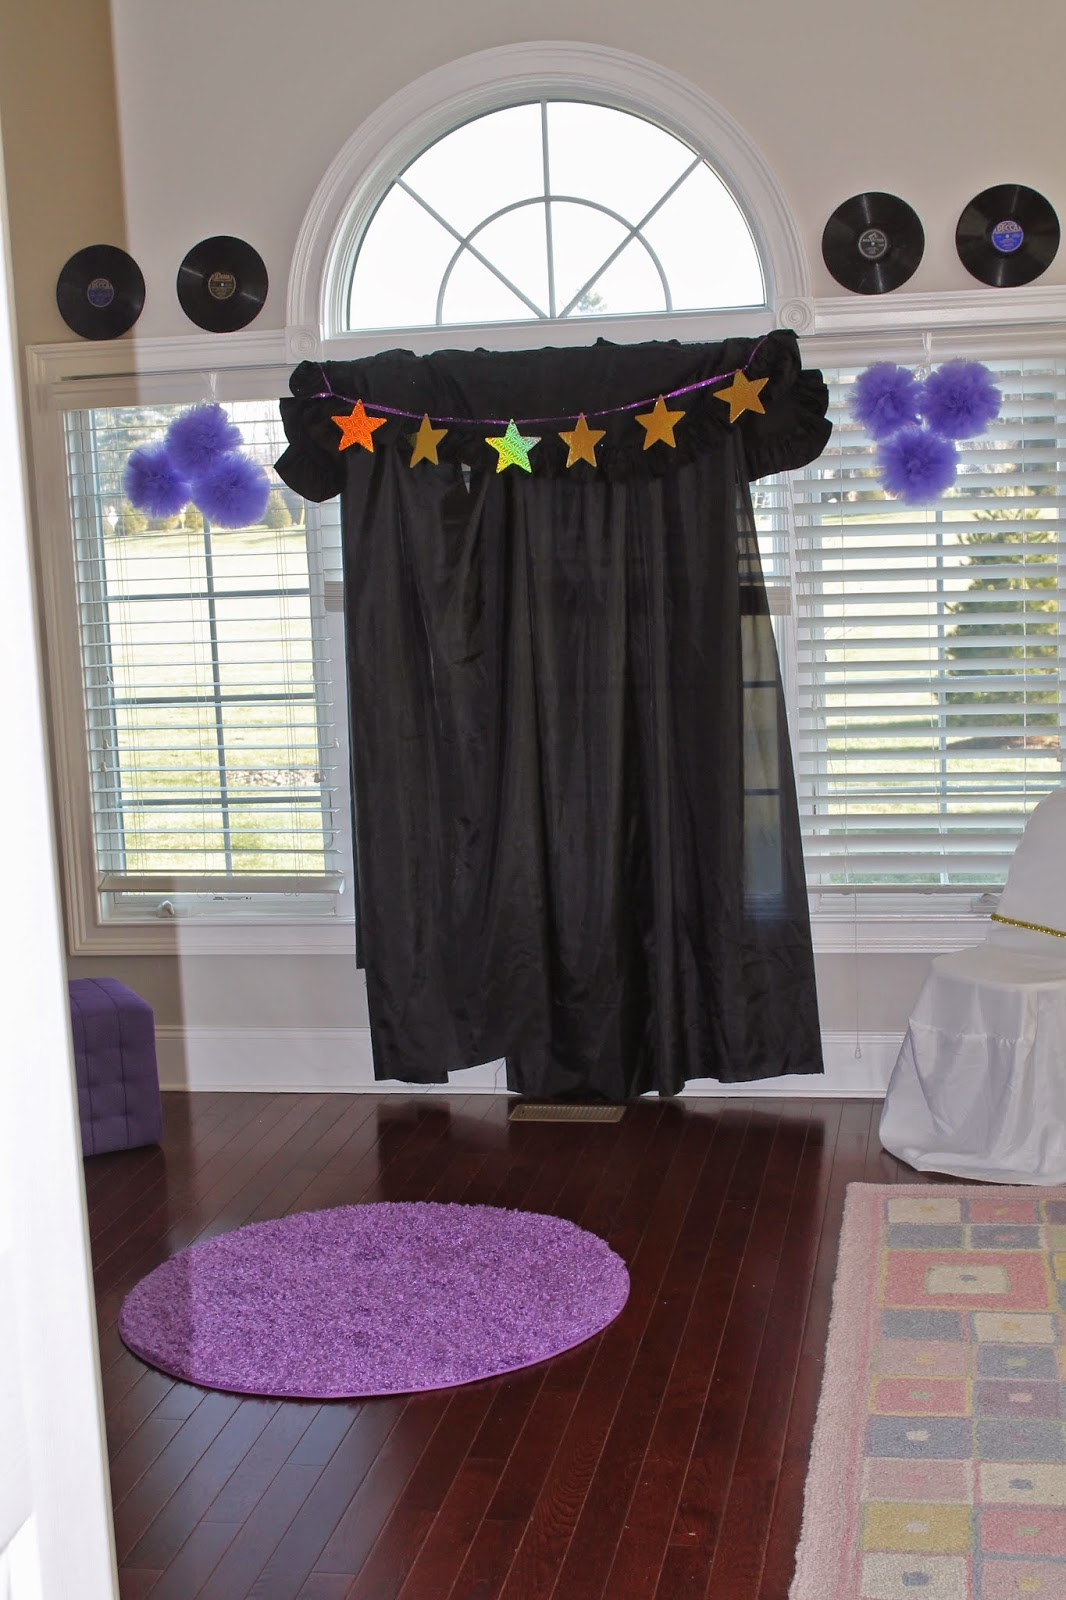 Pretti mini blog 20 ways to create an amazing pop star party for Decor yo pops